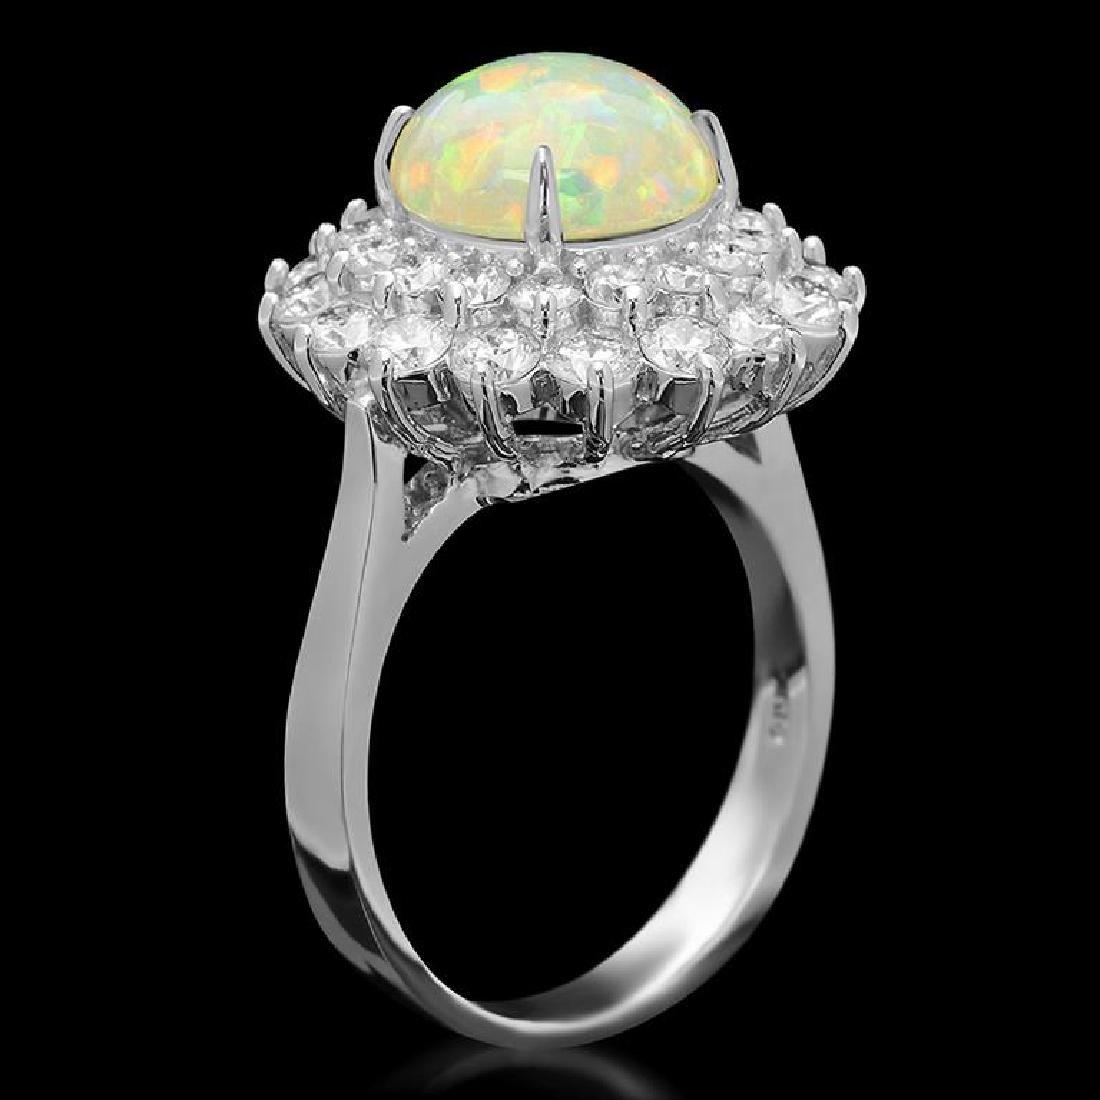 14k Gold 2.73ct Opal 1.95ct Diamond Ring - 2